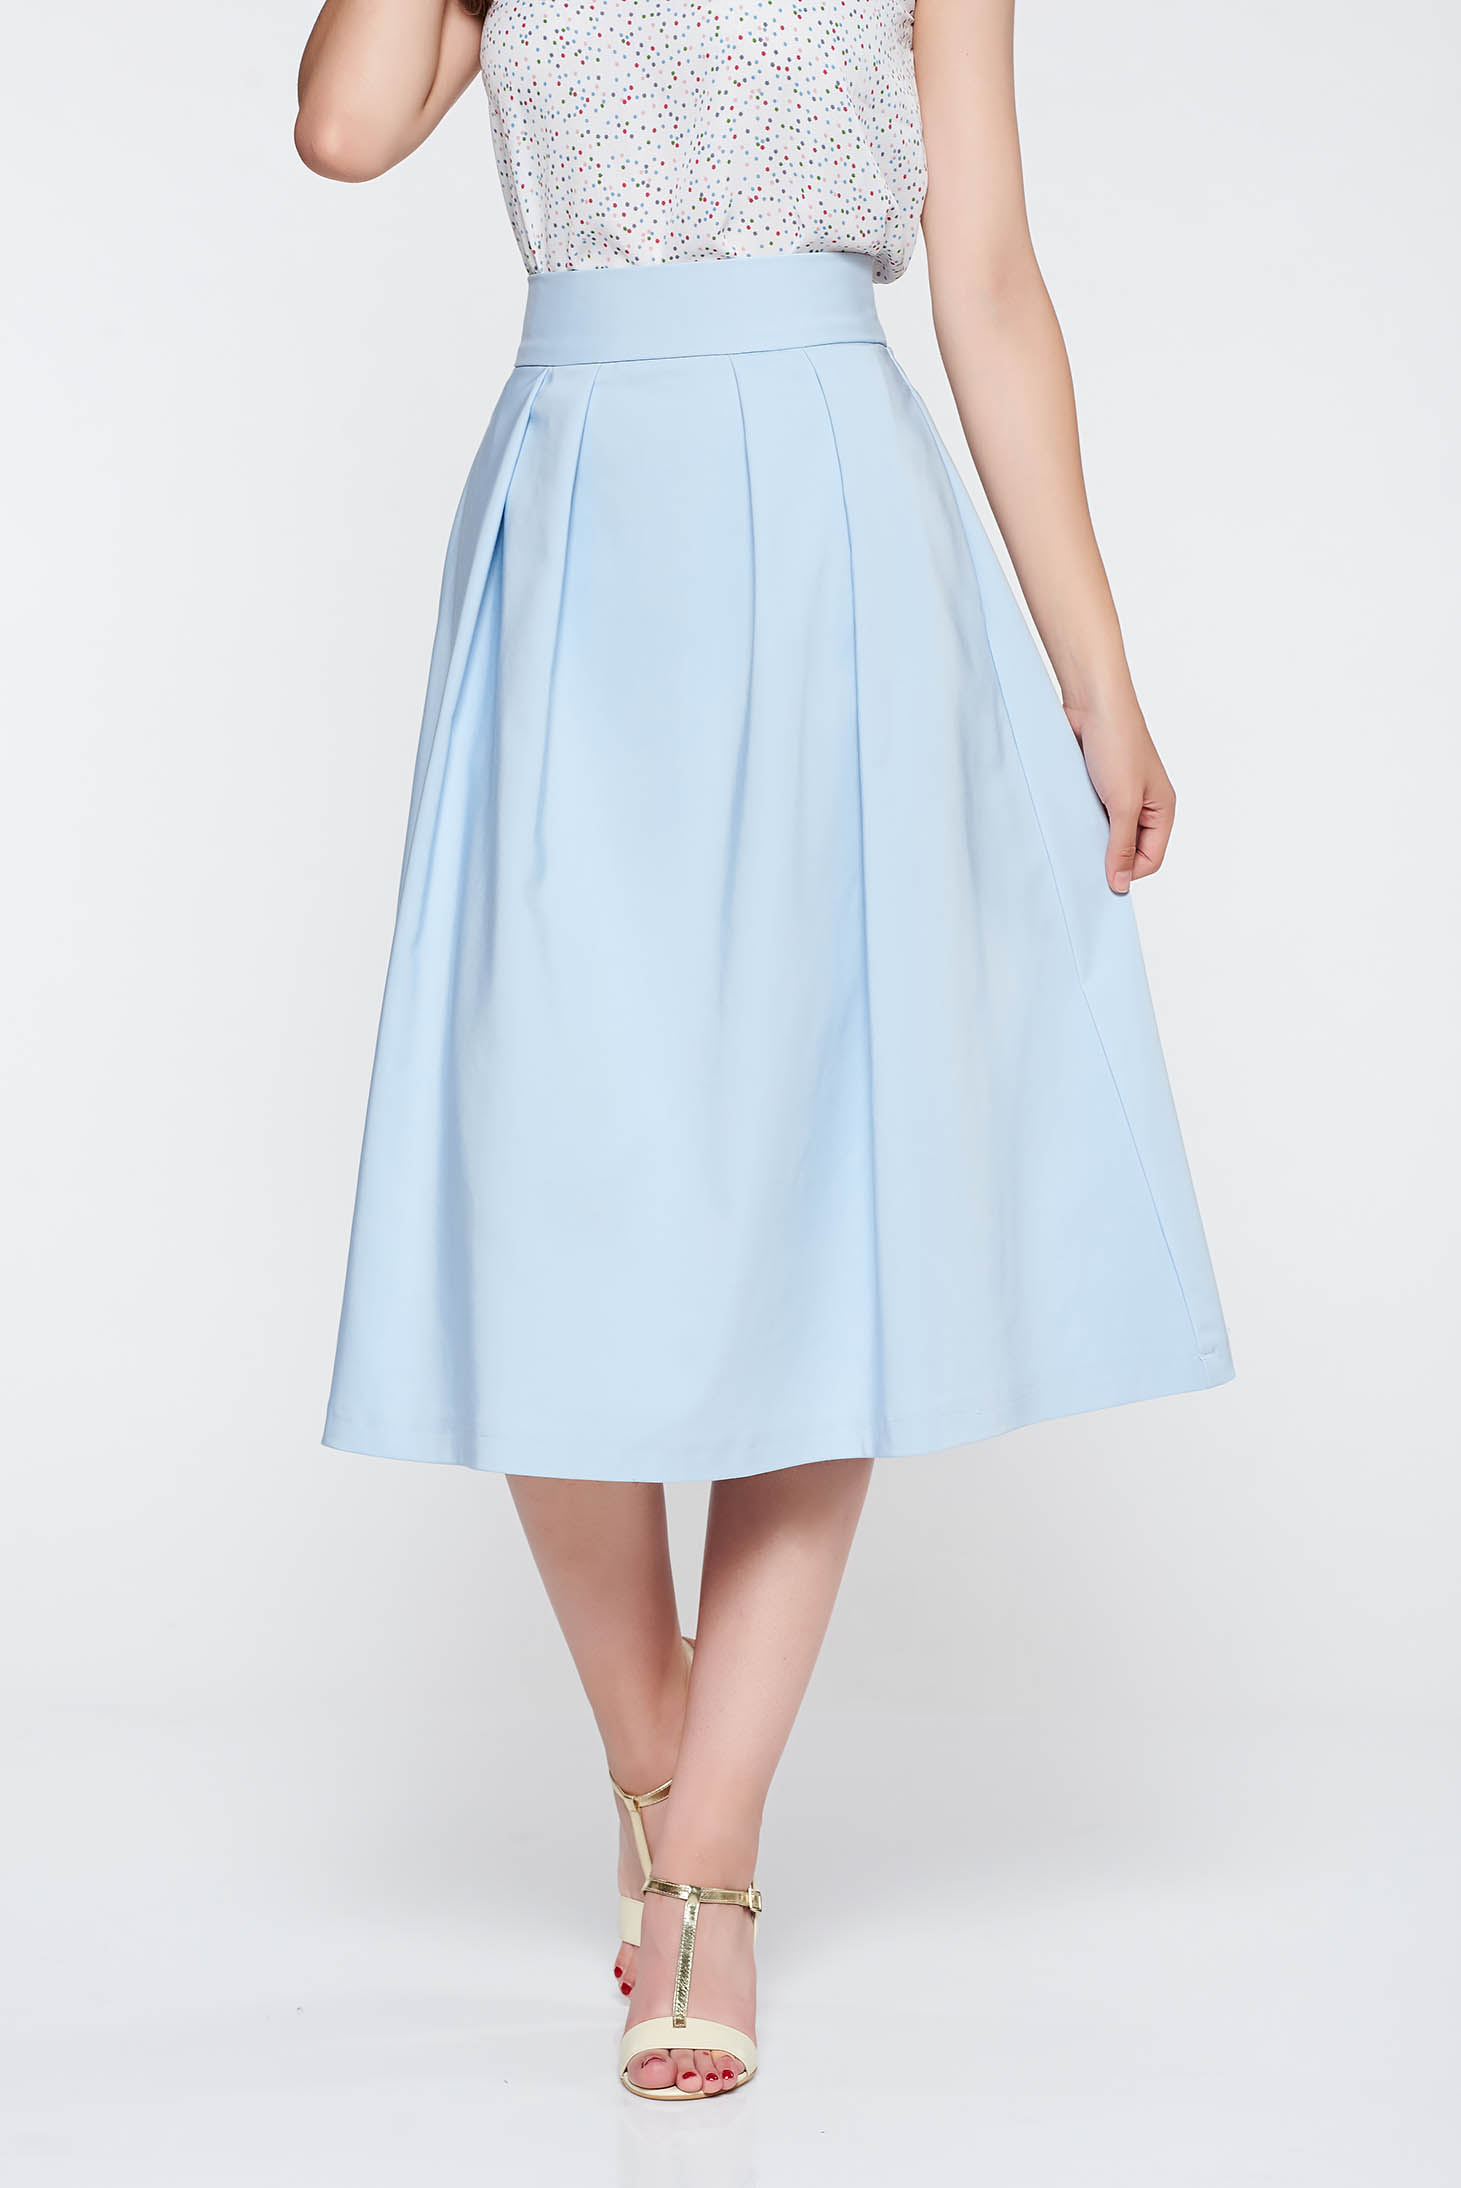 Fusta StarShinerS albastra-deschis eleganta in clos cu talie inalta din stofa neelastica